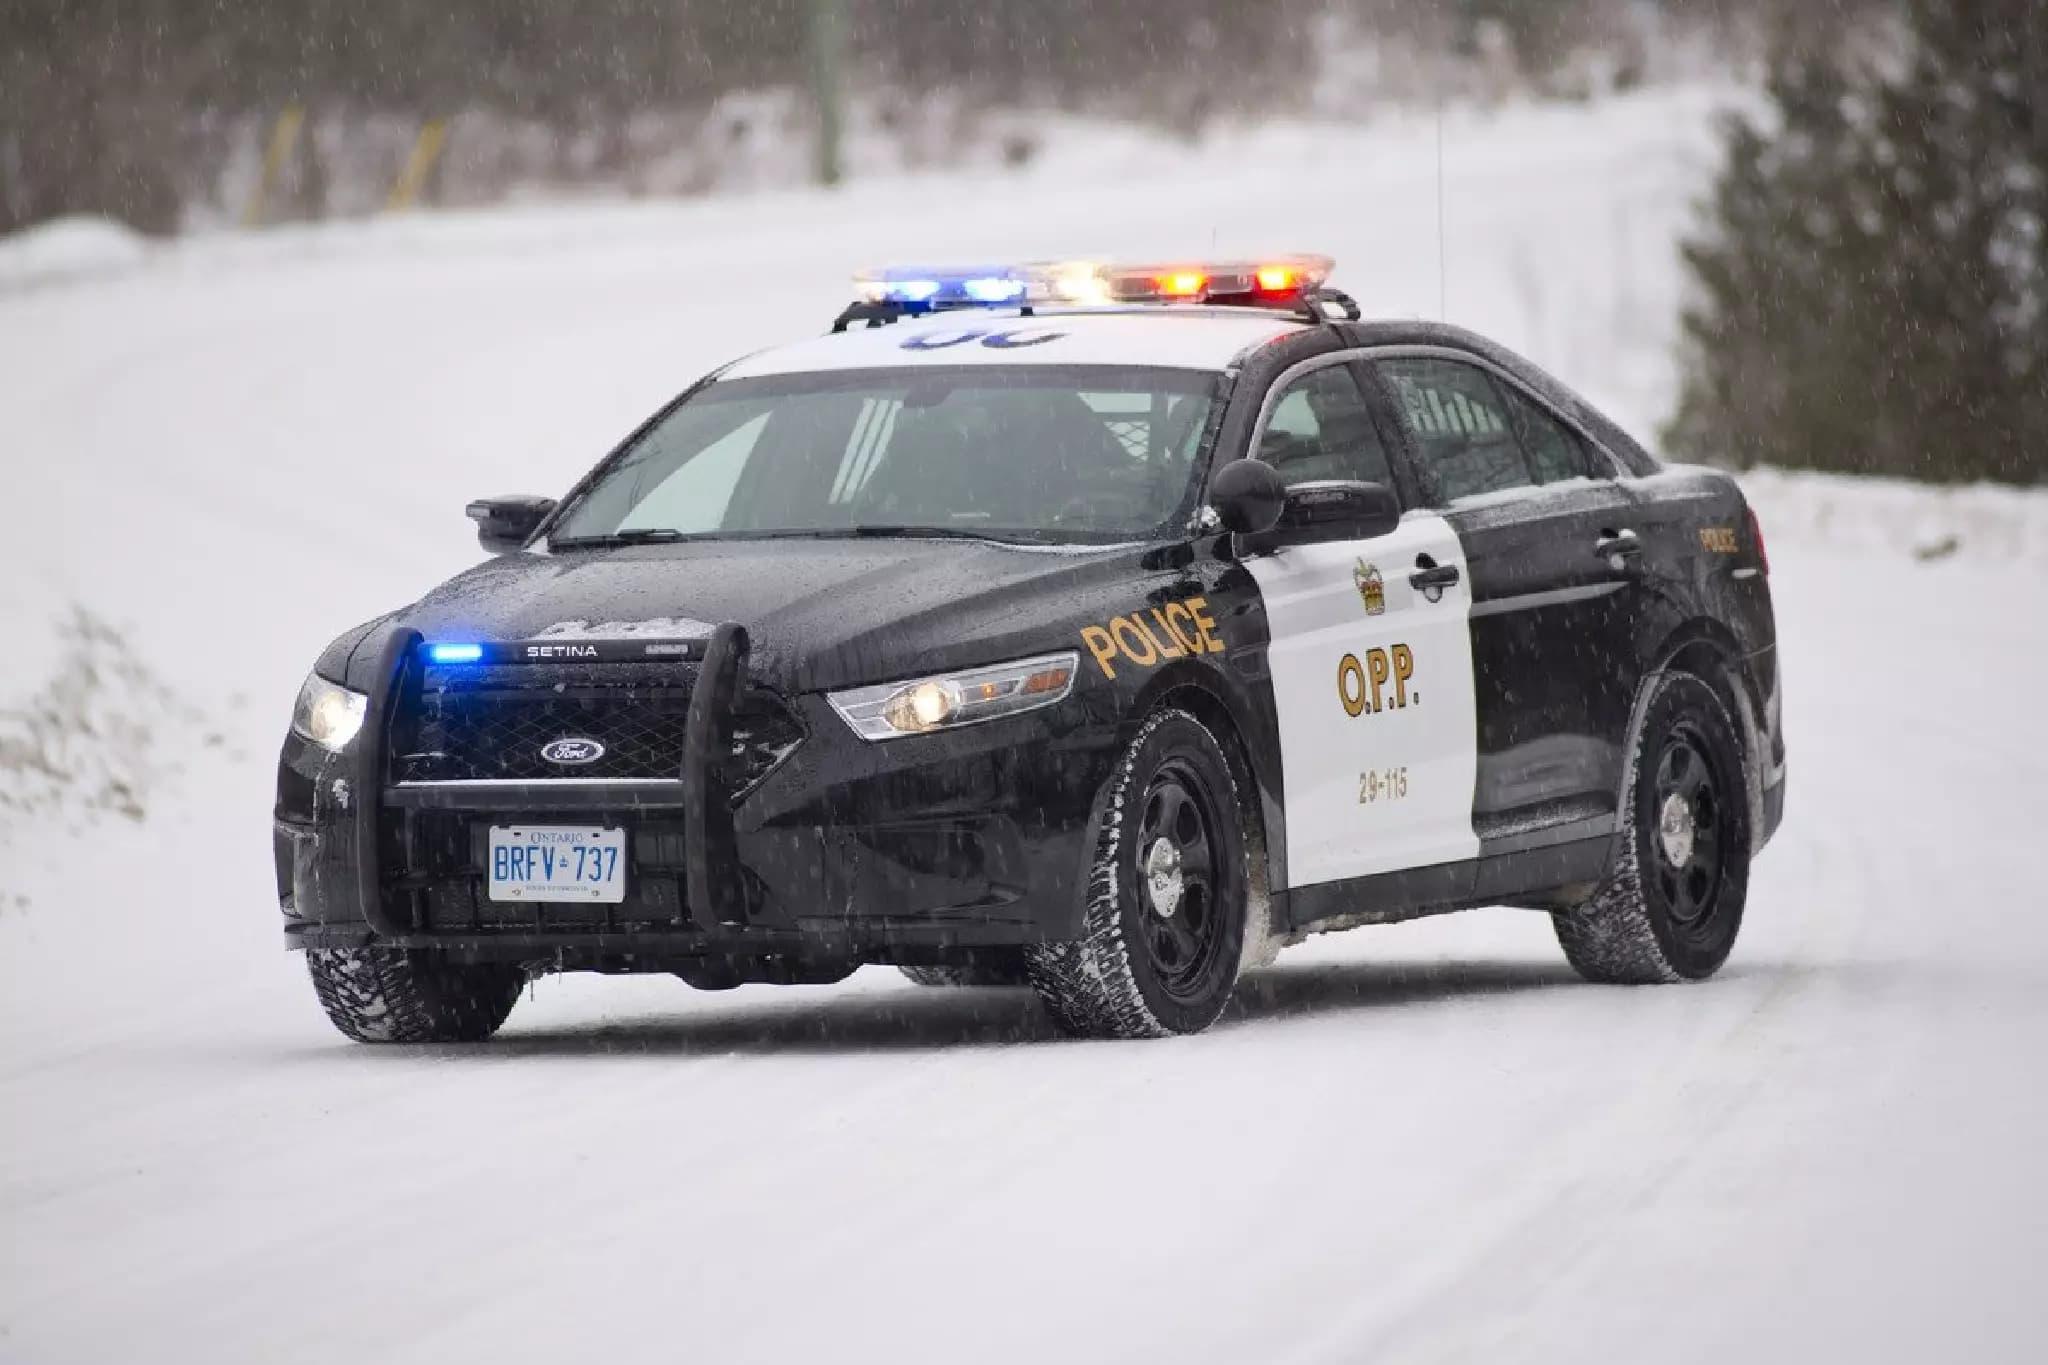 انتاریو؛ نوجوان کانادائی به پلیس شکایت کرد که کارت شناسائی جعلی او را نفرستادهاند